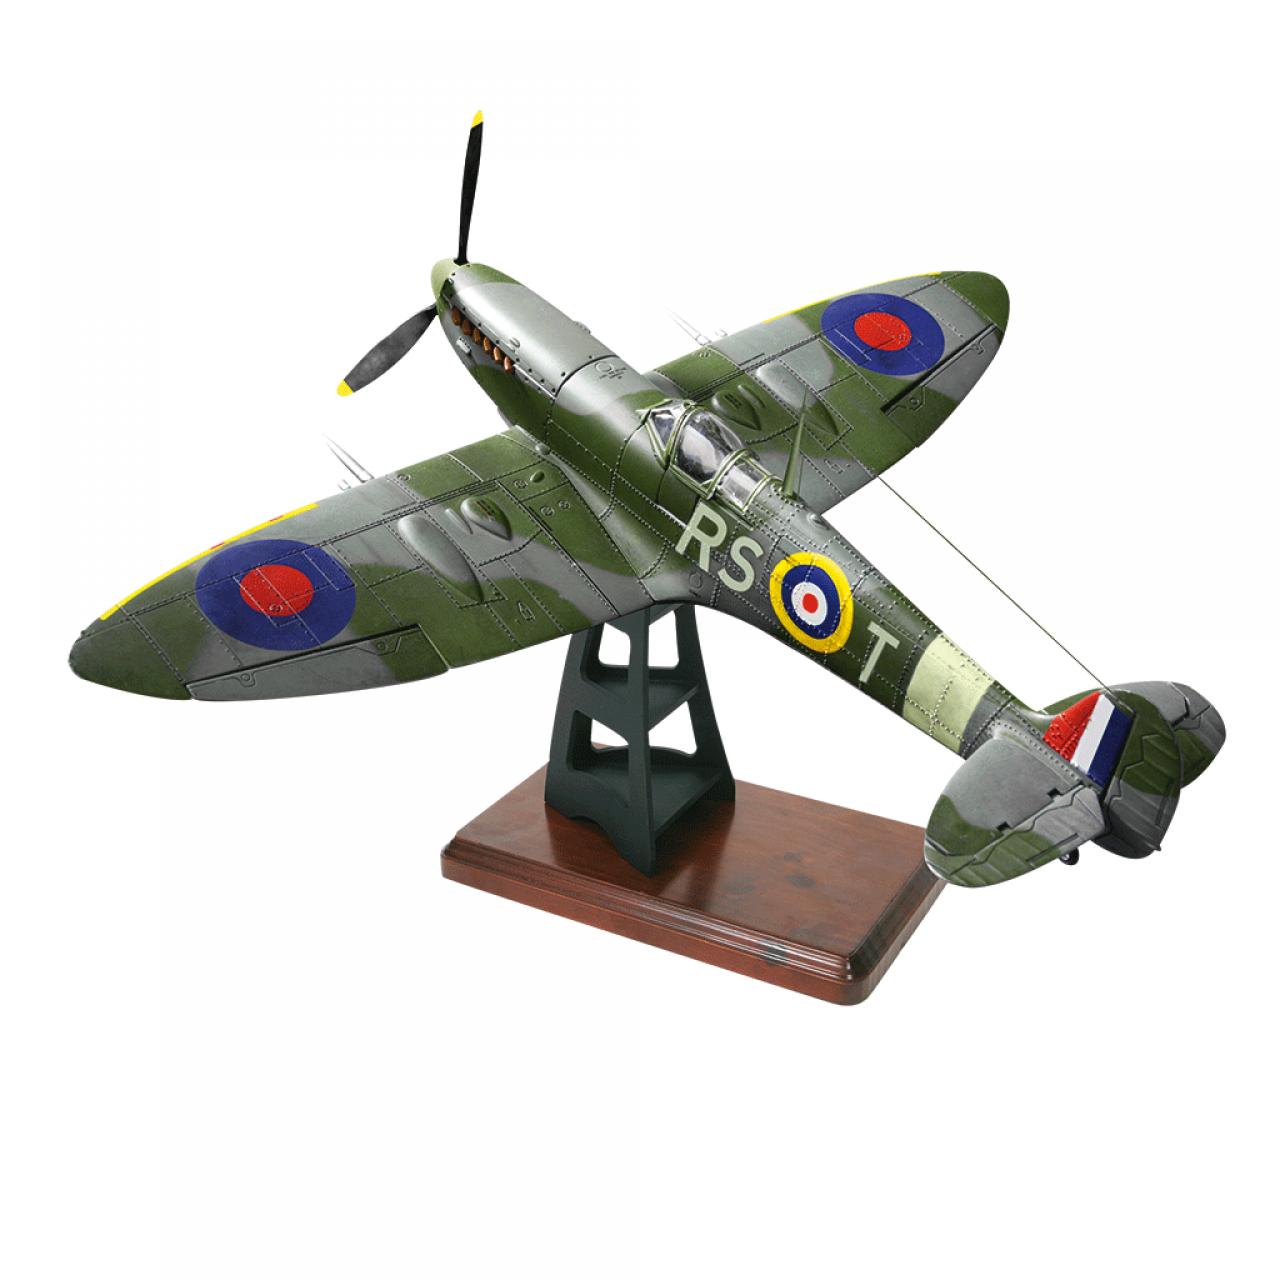 Spitfire Model Airplane 1 12 Scale De Agostini Modelspace